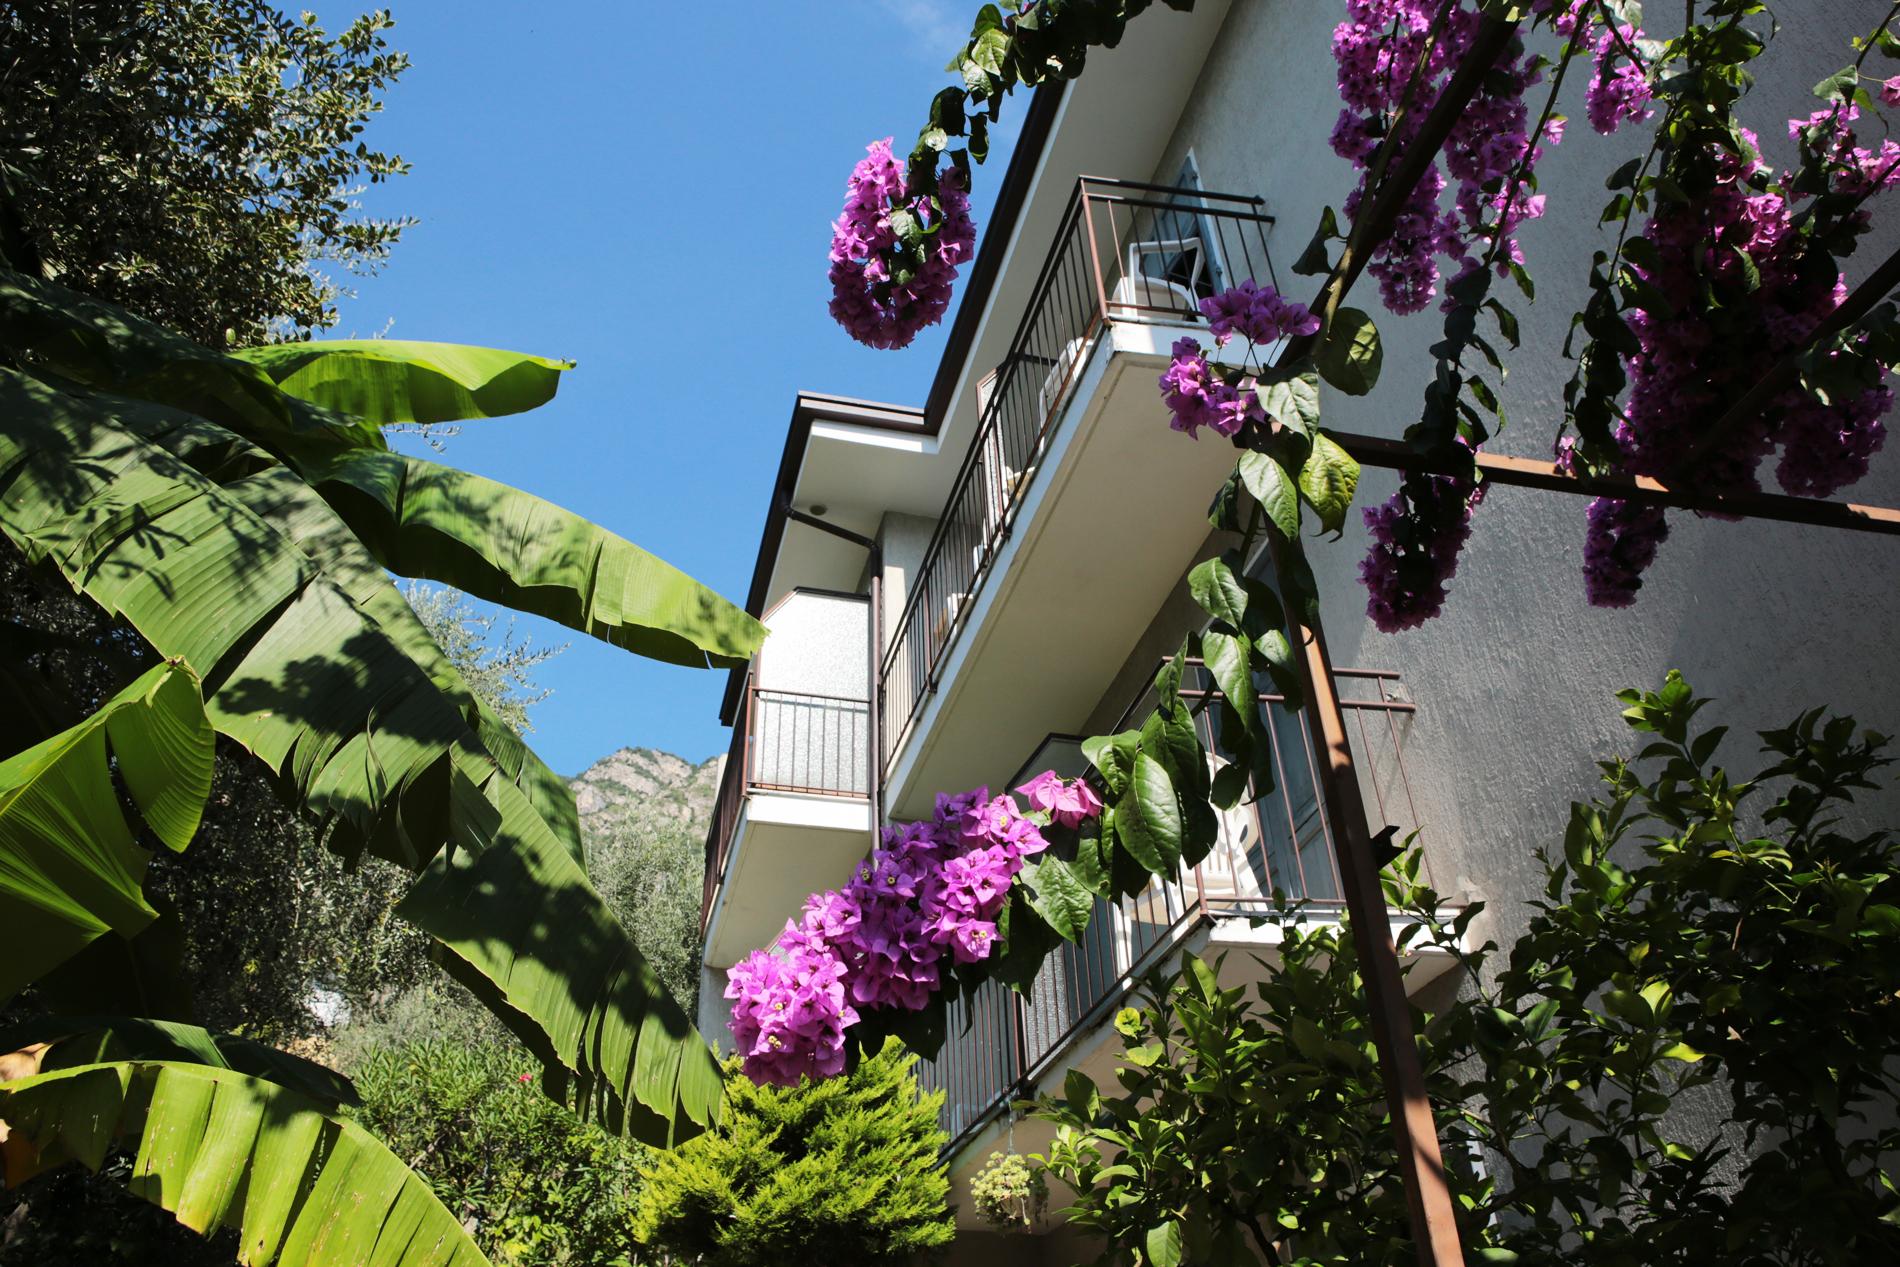 limone_sul_garda_hotel_silvana_vista_lago105.jpg